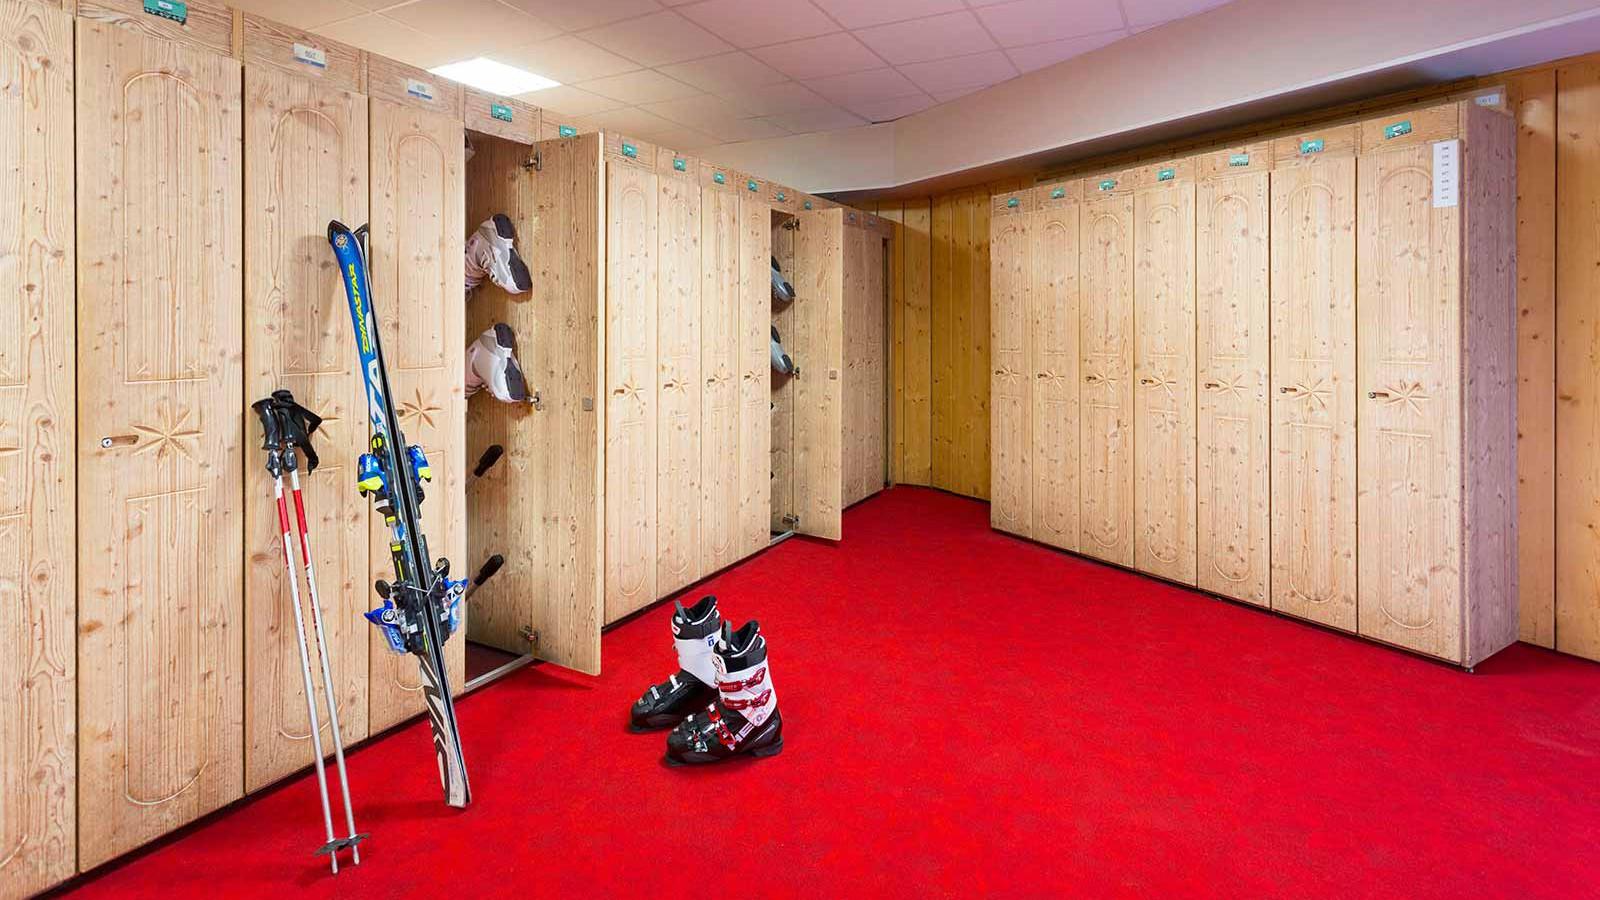 Hotel Club Les Arolles, ValThorens - Ski Lockers